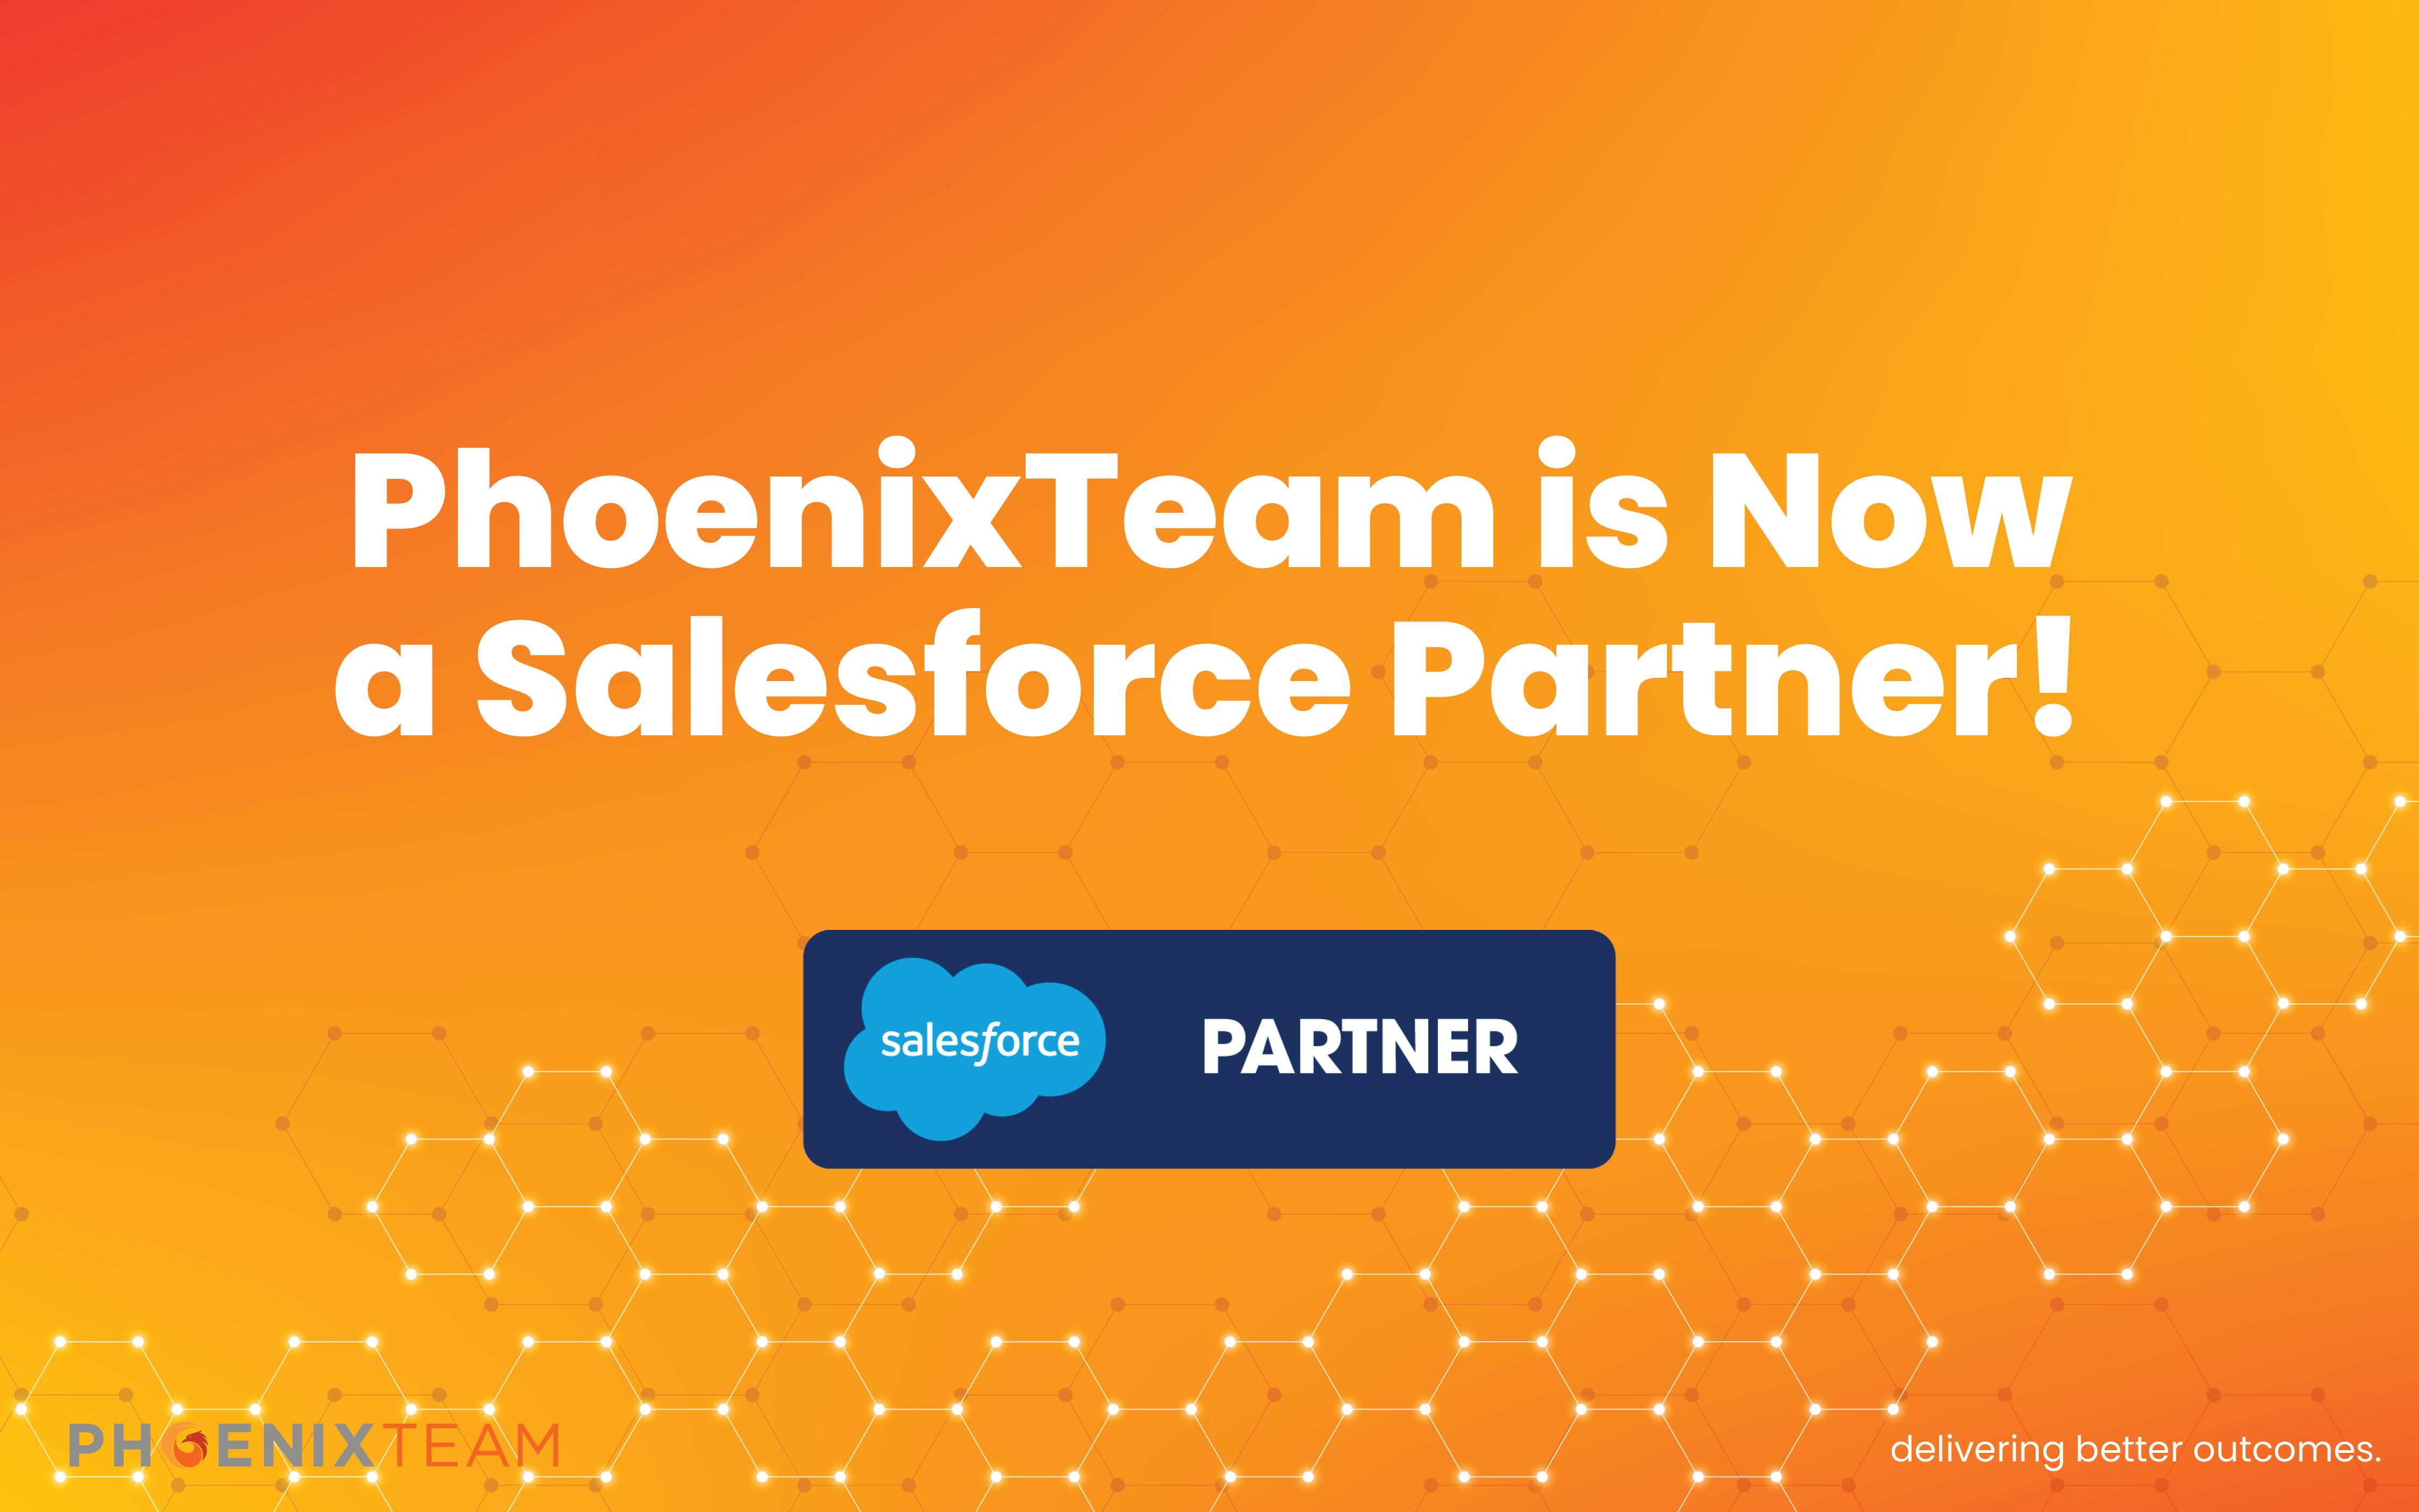 PhoenixTeam Salesforce Partner